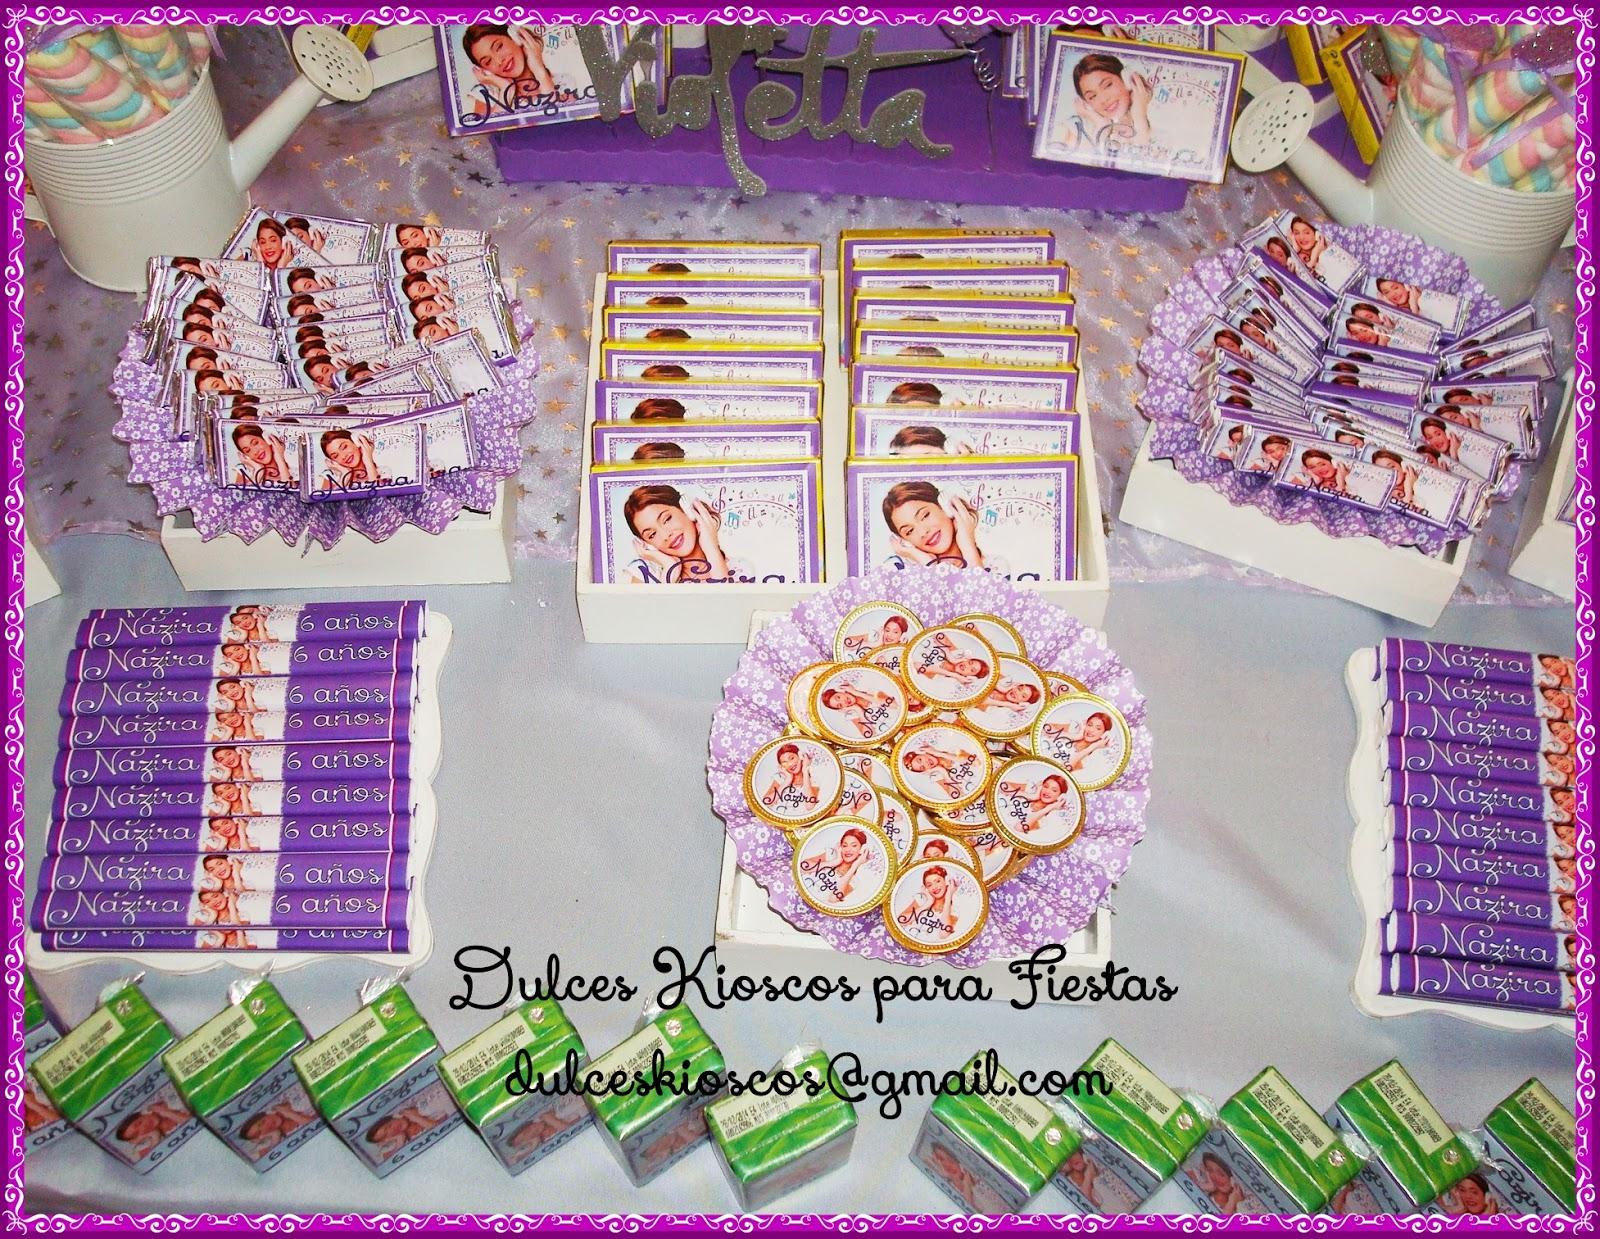 Decoracion Kiosco Golosinas ~ 25 De Violetta Un Super Kiosco Tem&225tico Lleno Golosinas